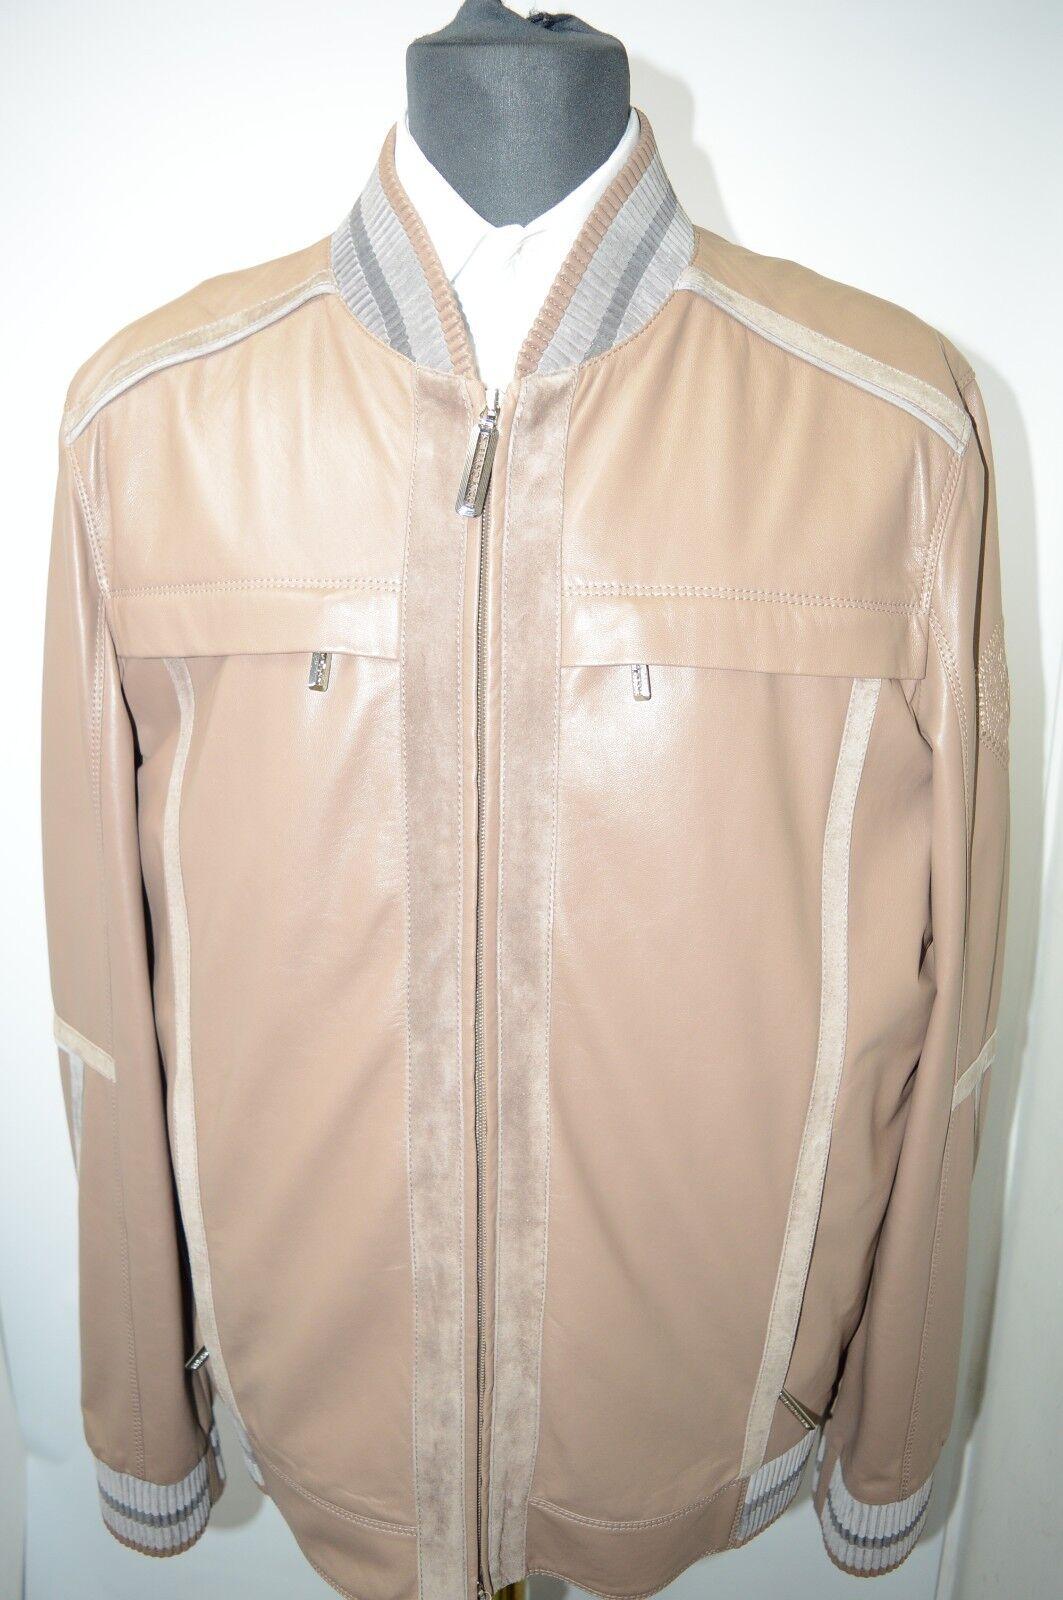 NEW 10450,00  STEFANO RICCI Outwear Coat Leder Us M Eu 50 G123